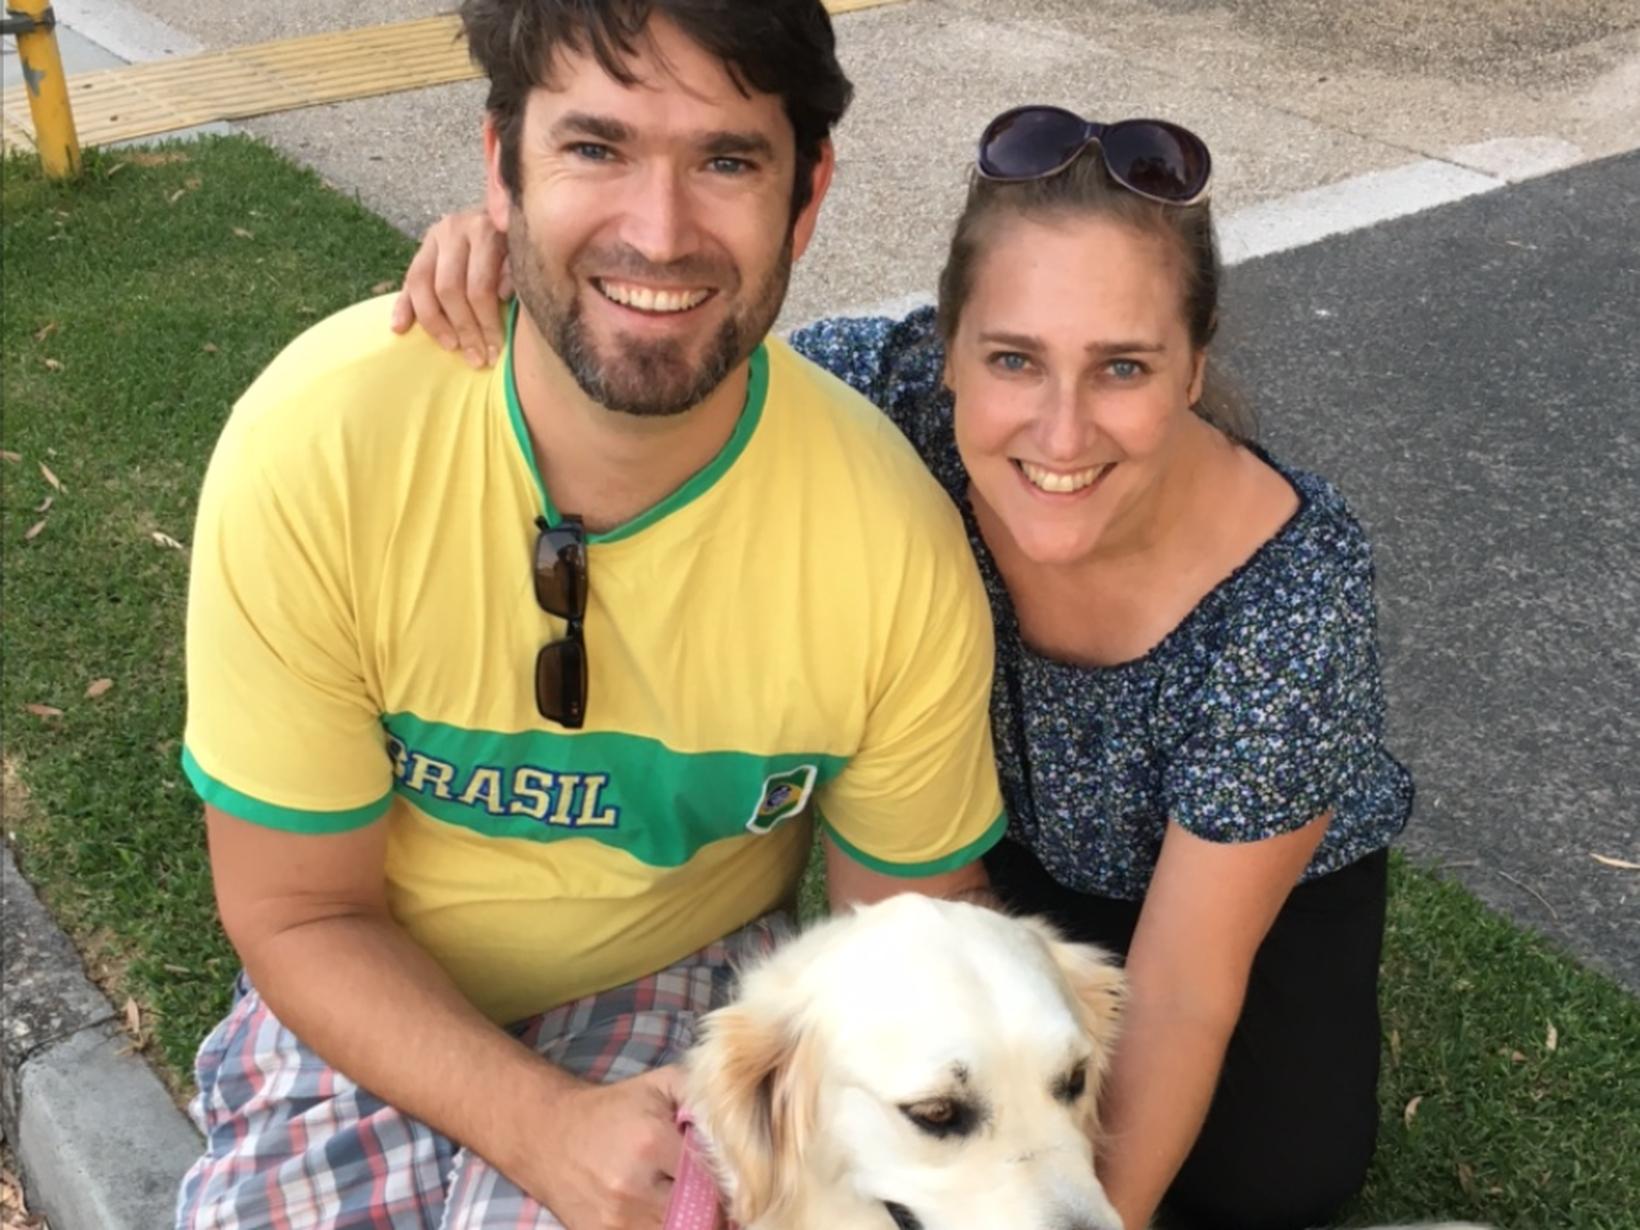 Ryan and melina & Ryan from Brisbane, Queensland, Australia